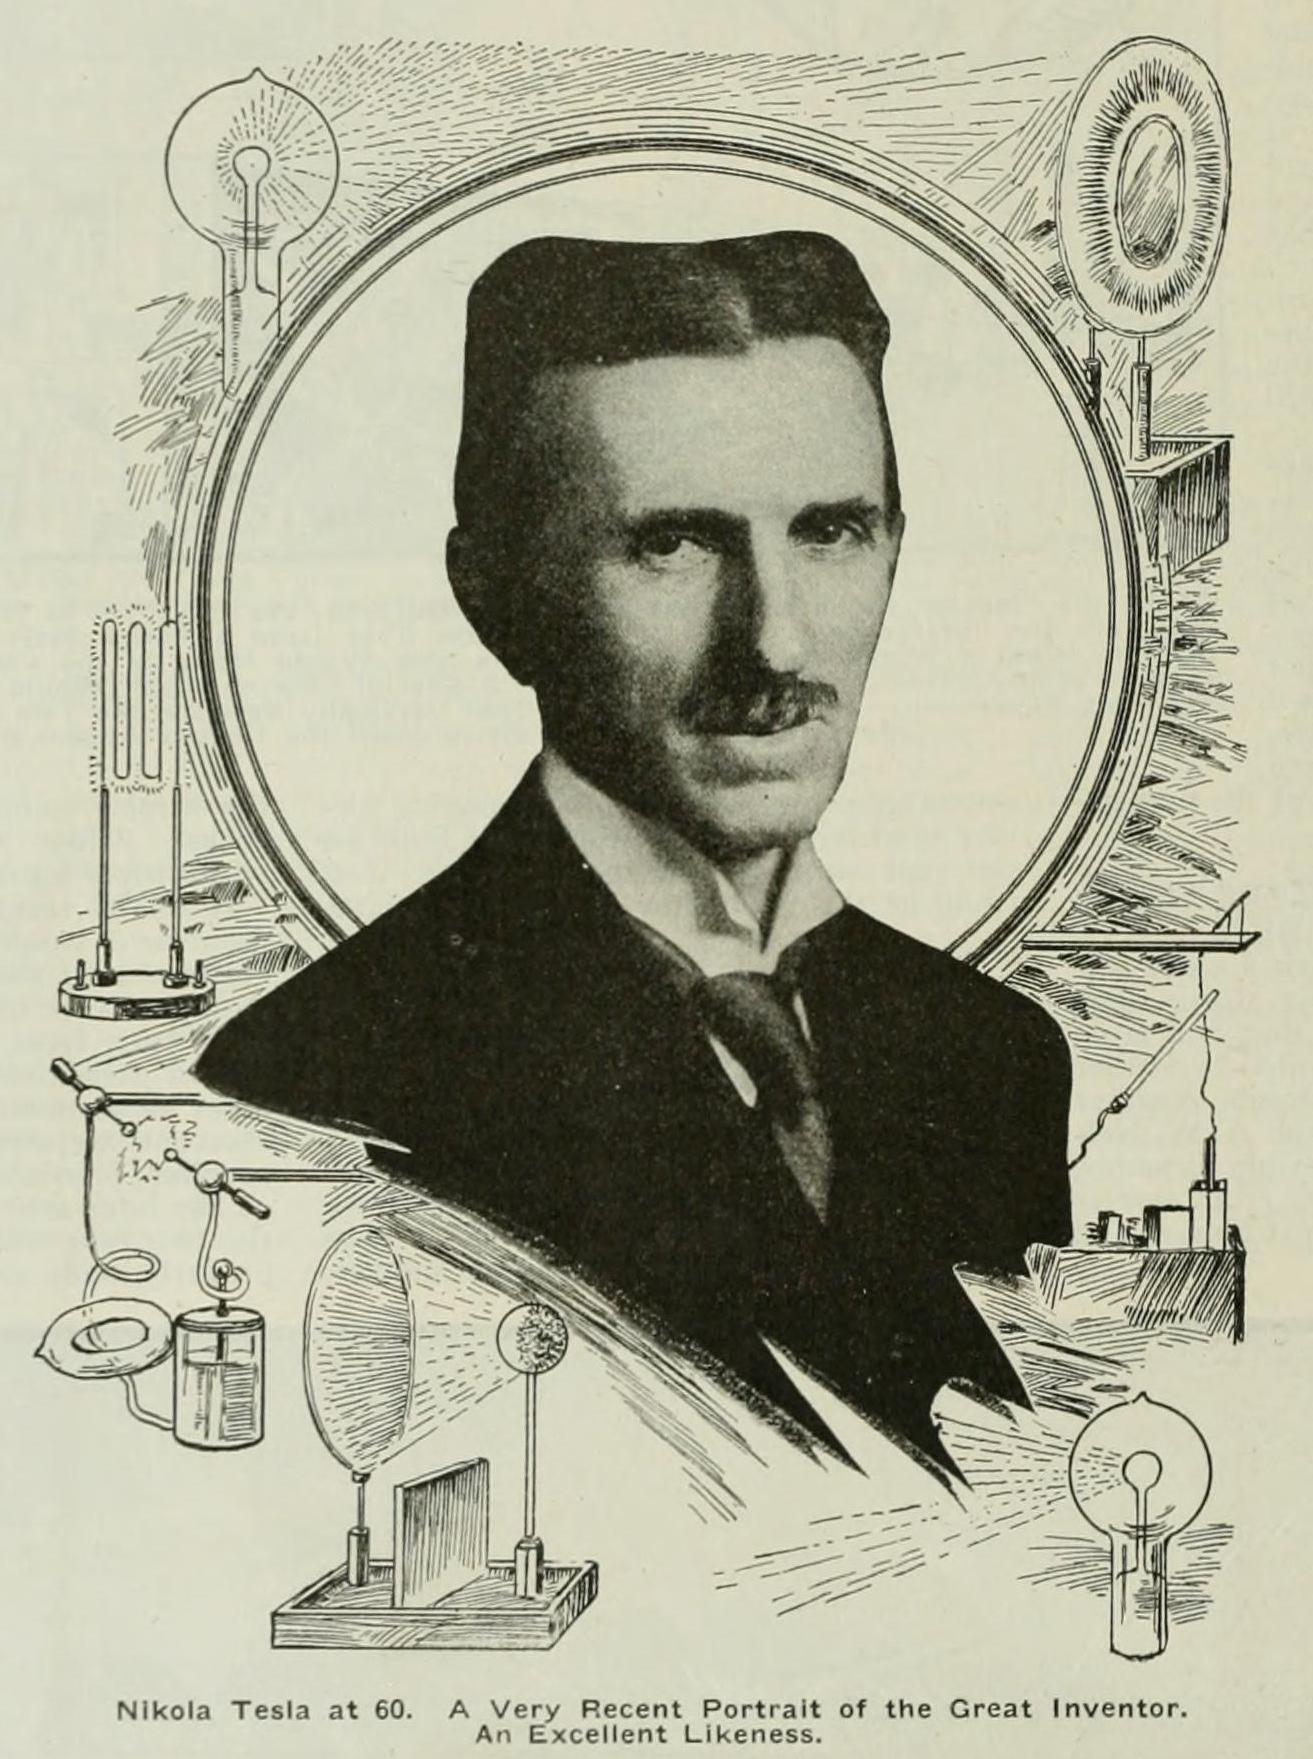 Nikola Tesla Age 60